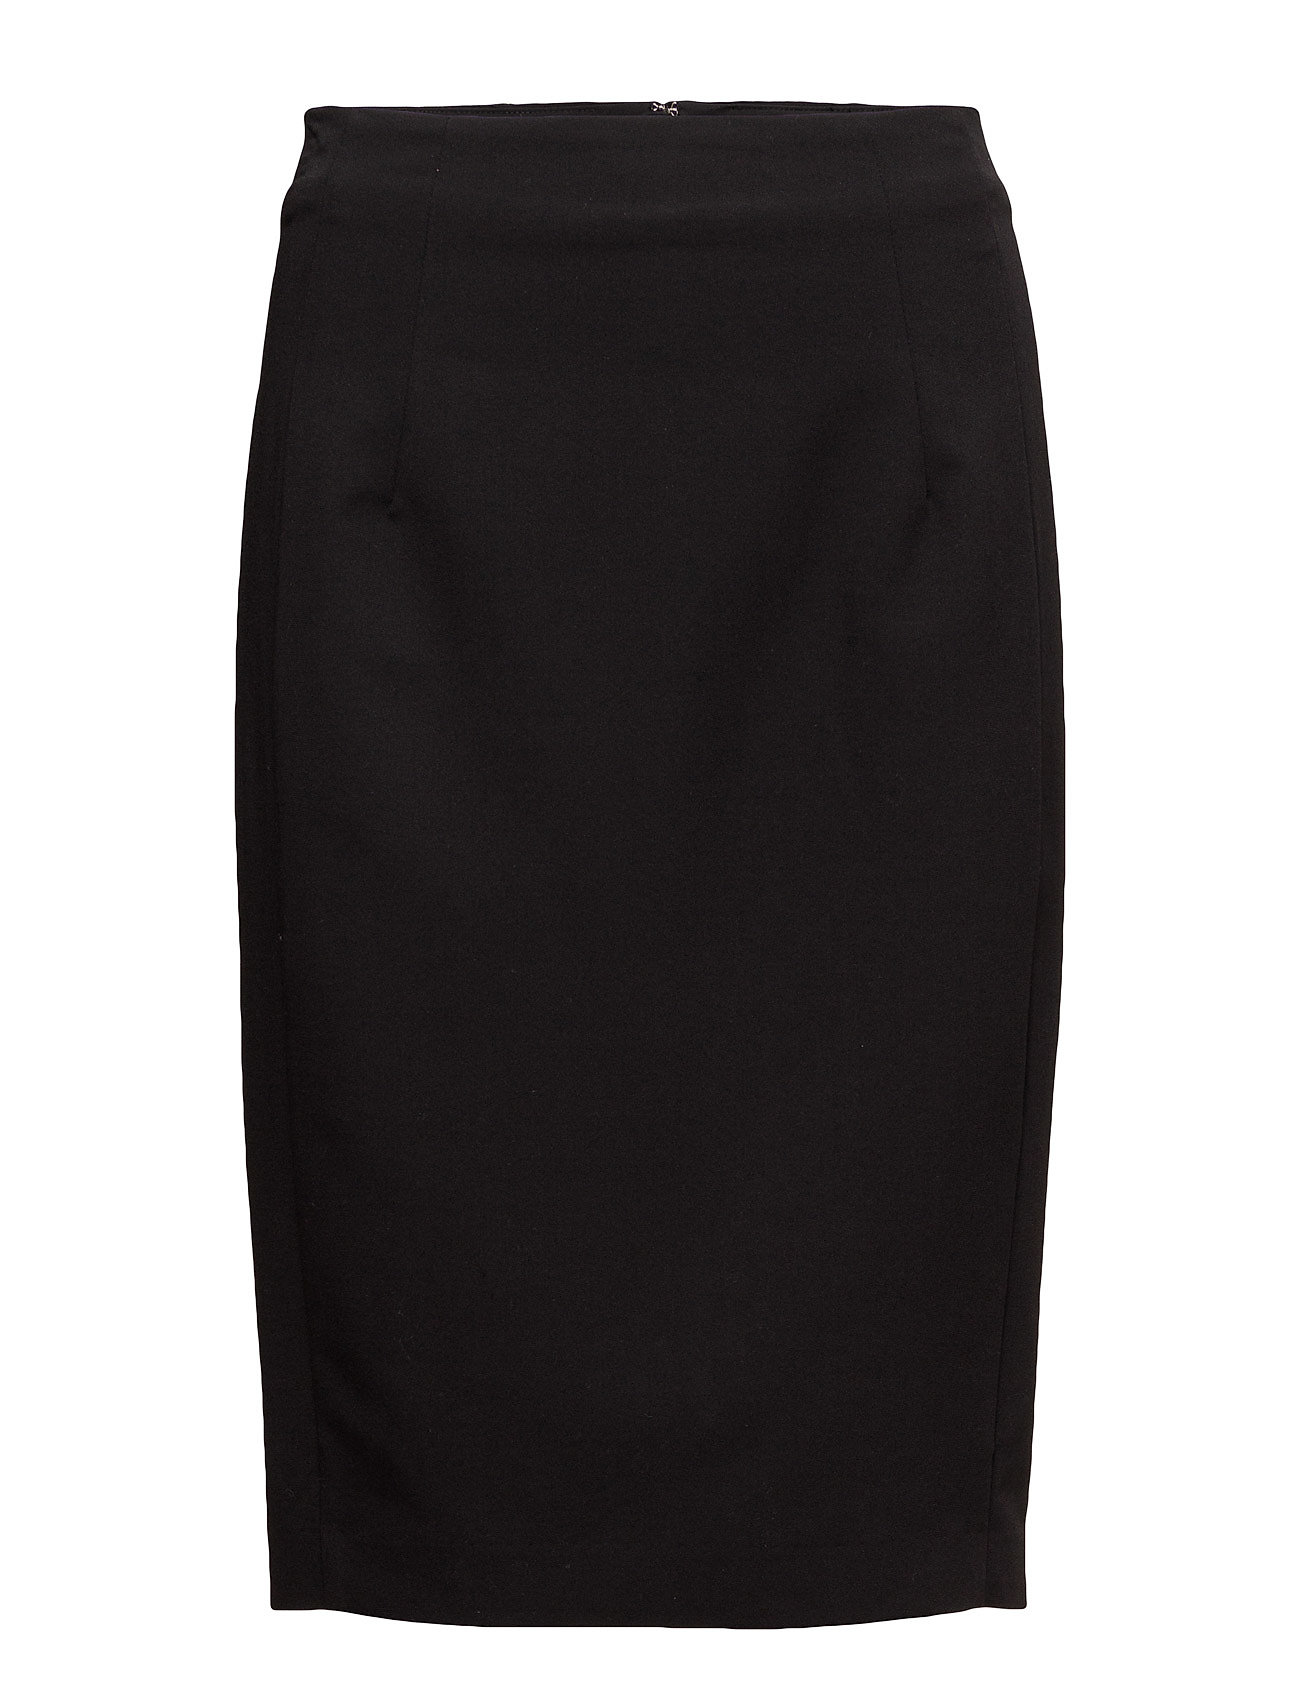 Leigh Pencil Skirt Hw InWear Skirts thumbnail